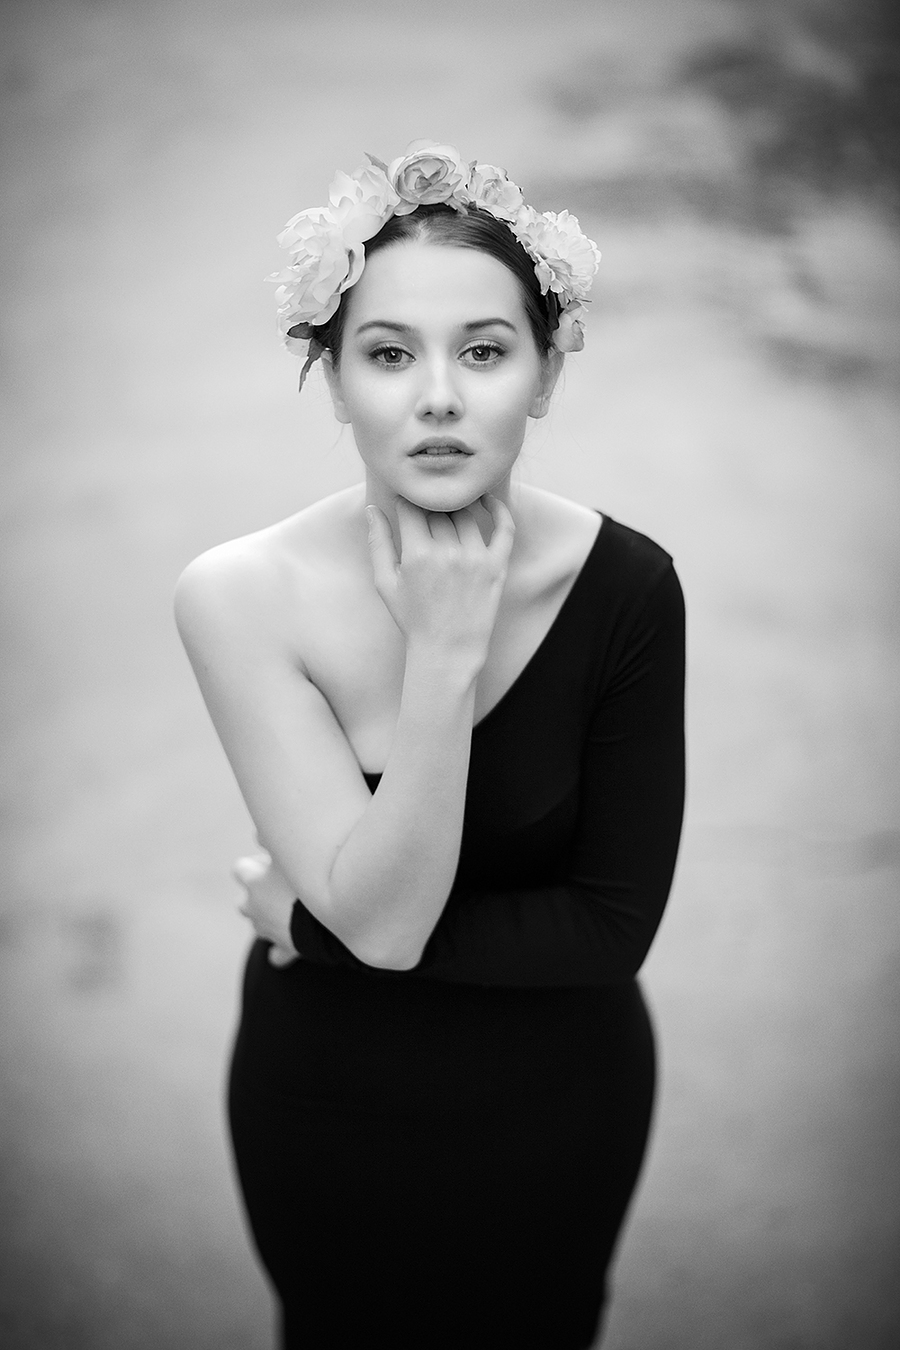 Dominika at ArtAsylum (4) / Photography by jakabi, Model Dominika Lowicka, Post processing by jakabi / Uploaded 4th December 2018 @ 08:39 PM